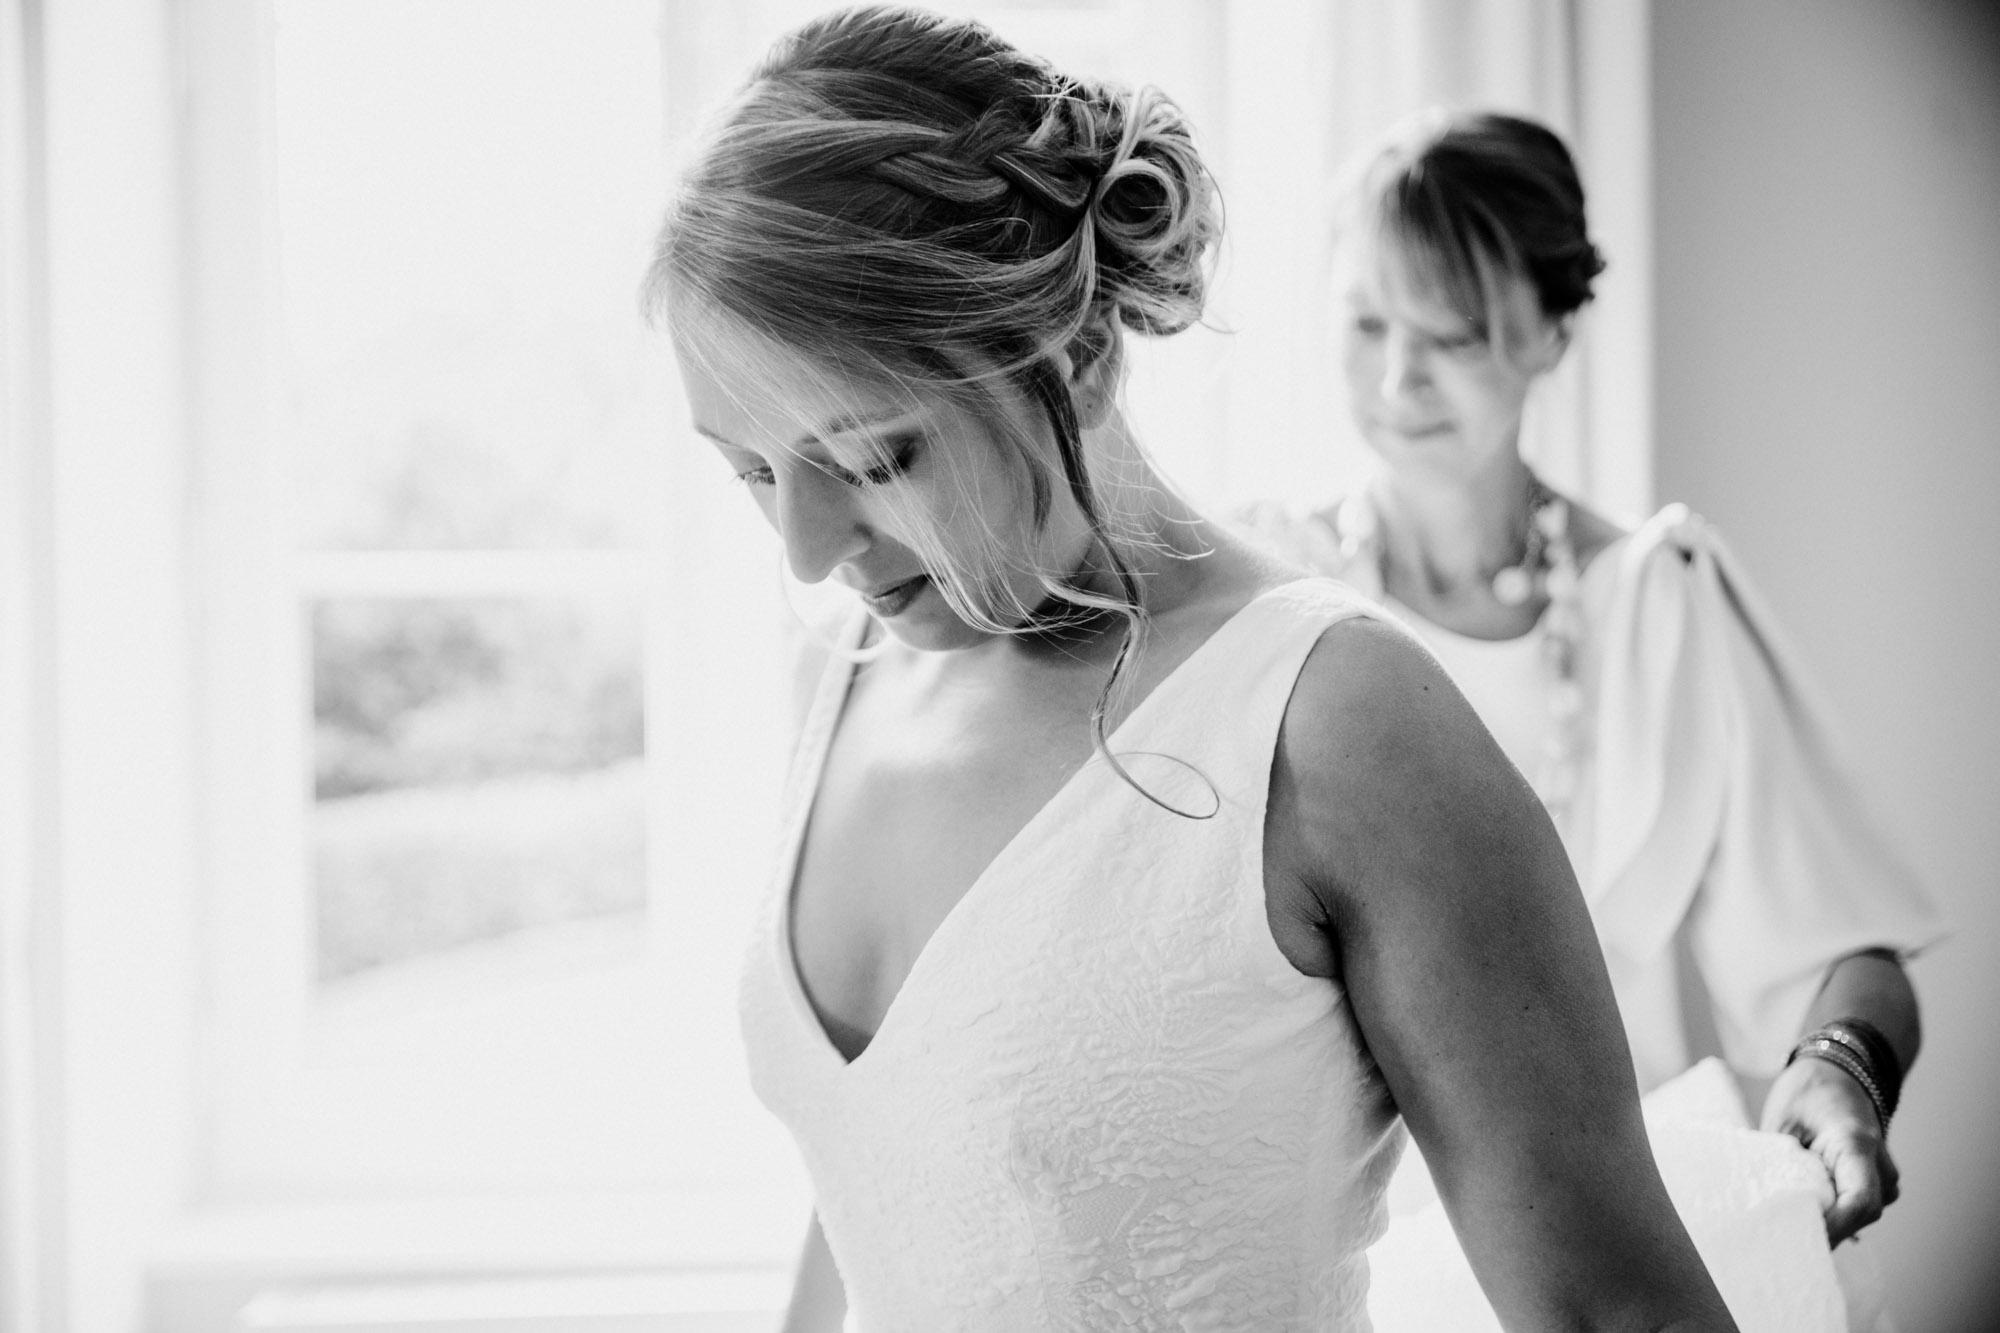 2018-07-21 - LD8_9597 - photographe mariage lyon - laurie diaz - www.lauriediazweeding.com.jpg